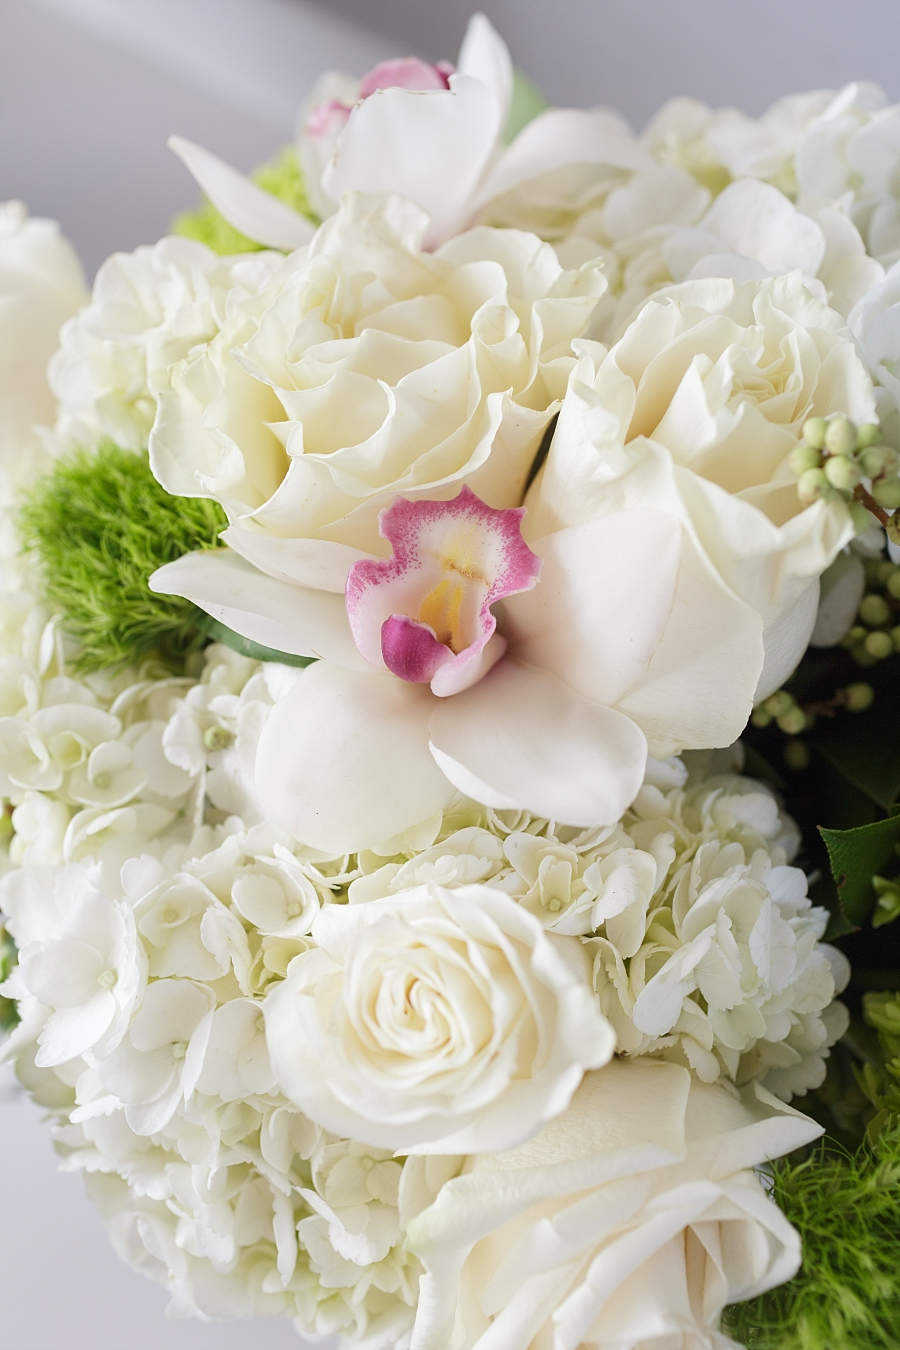 Stacy-Anderson-Photography-McGovern-Centennial-Gardens-Houston-Wedding-Photographer_0018.jpg